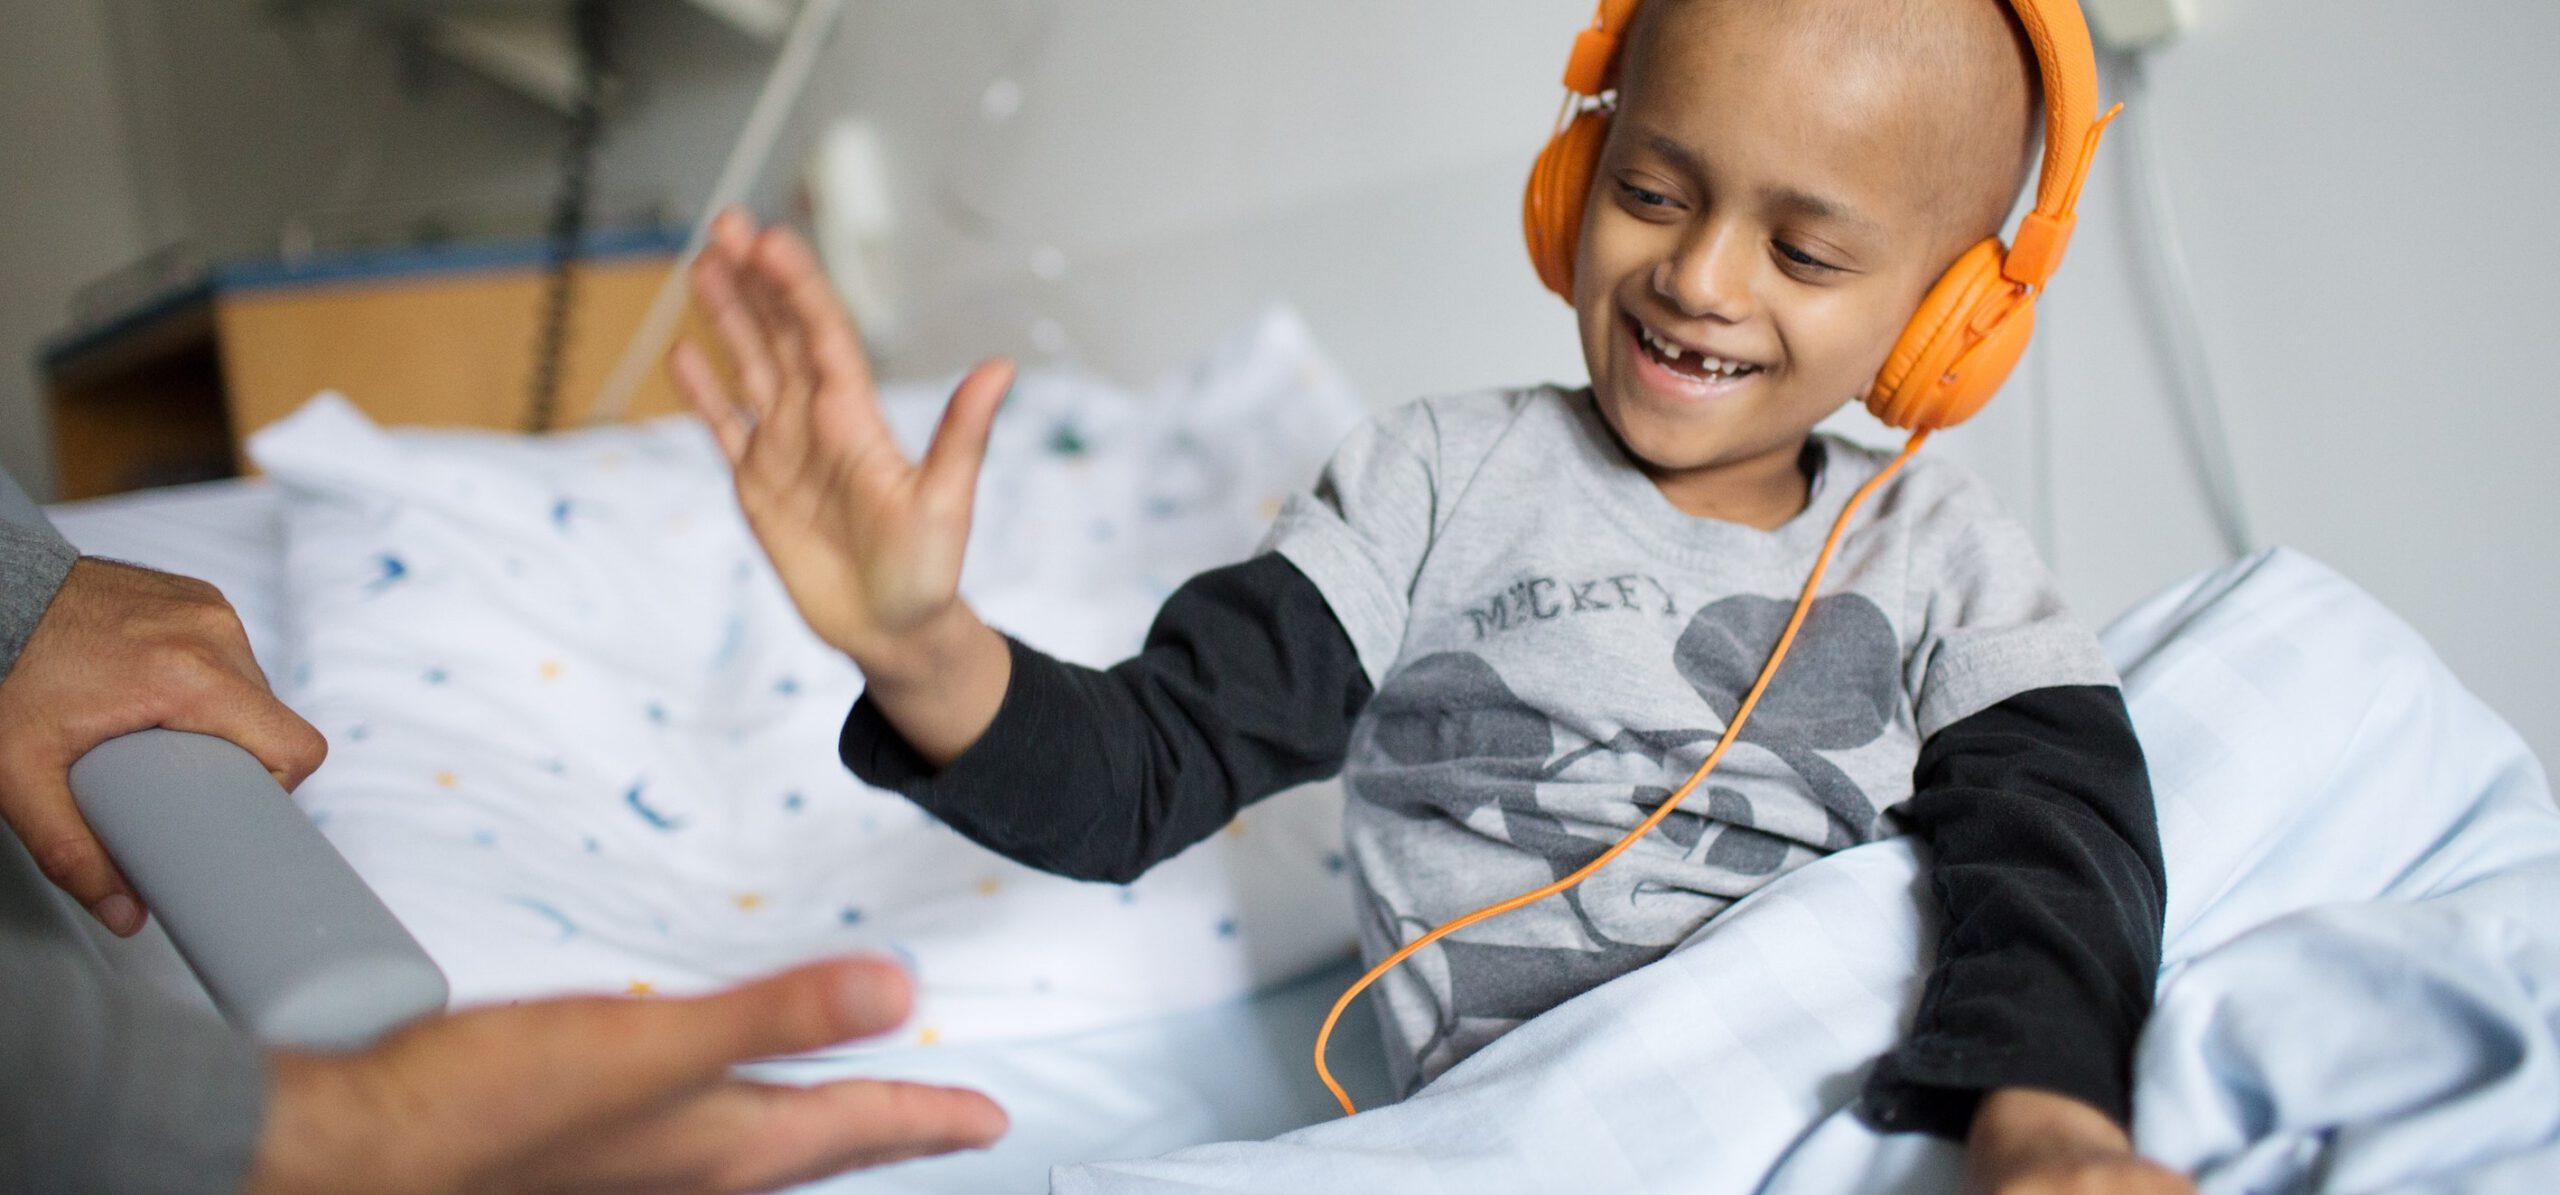 Kinderrechte und Kindermedizin